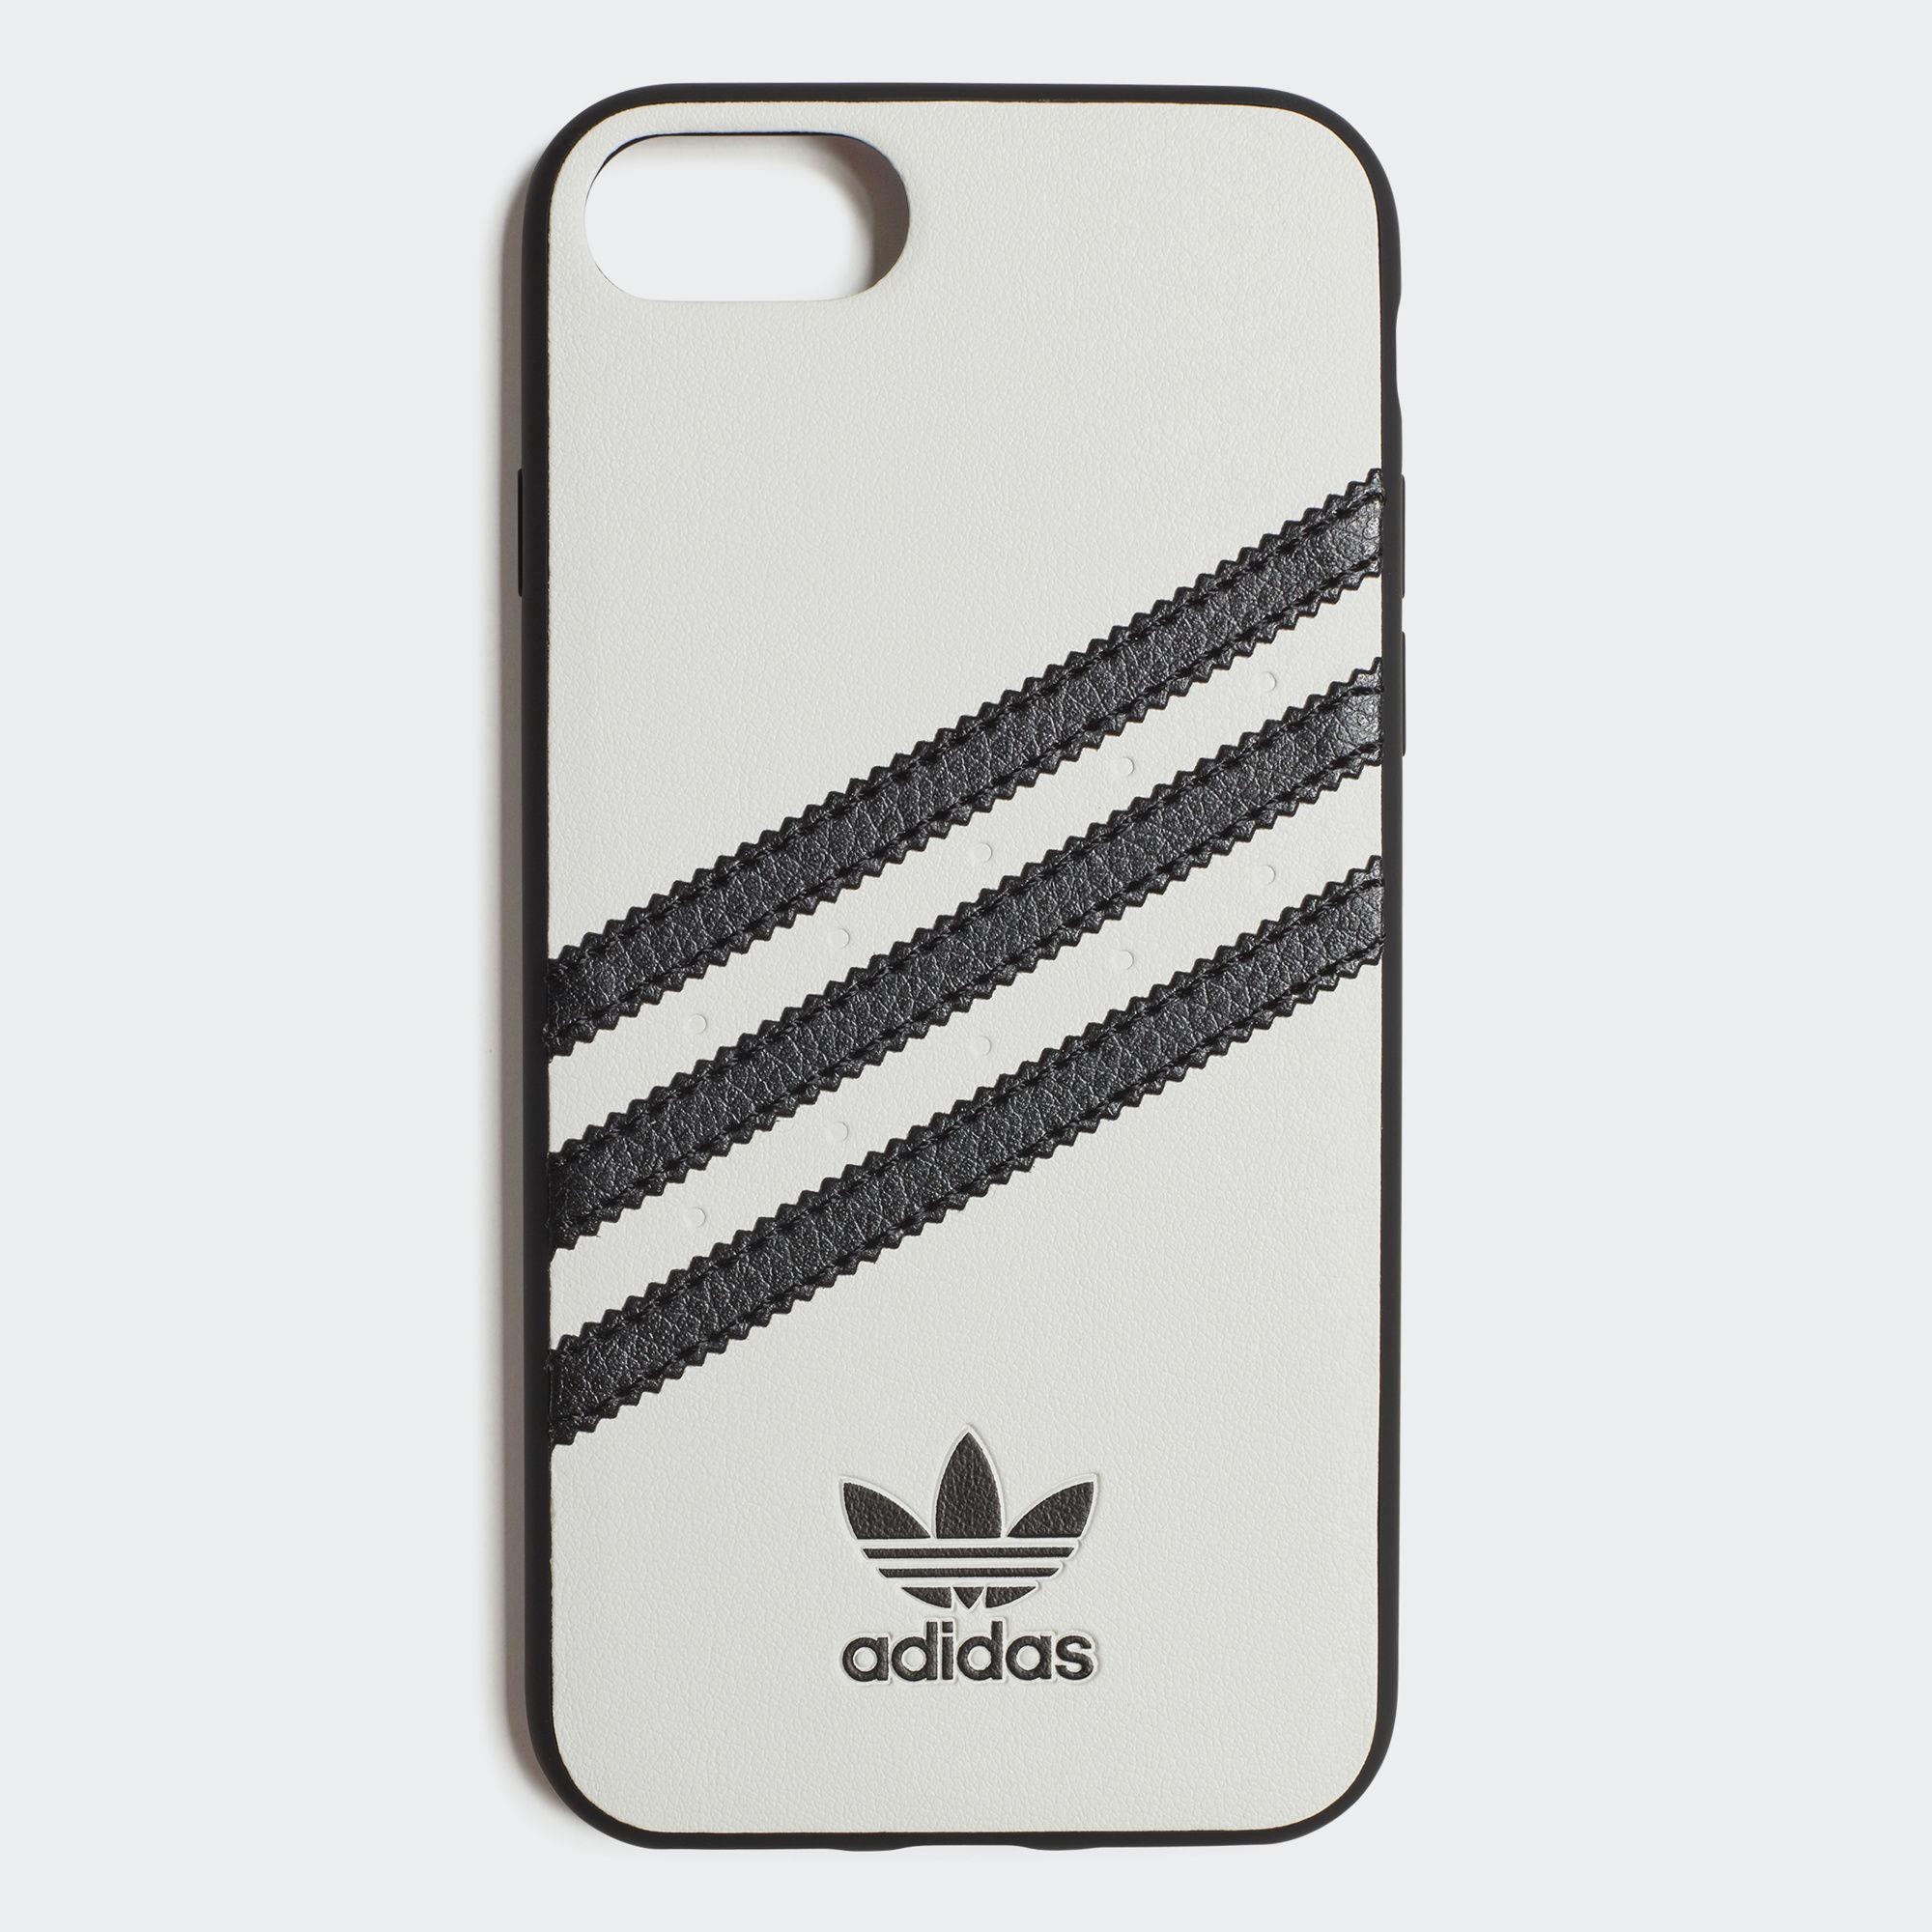 cfe7c727668a69 Adidas - Black Molded Case Iphone 8 - Lyst. View fullscreen